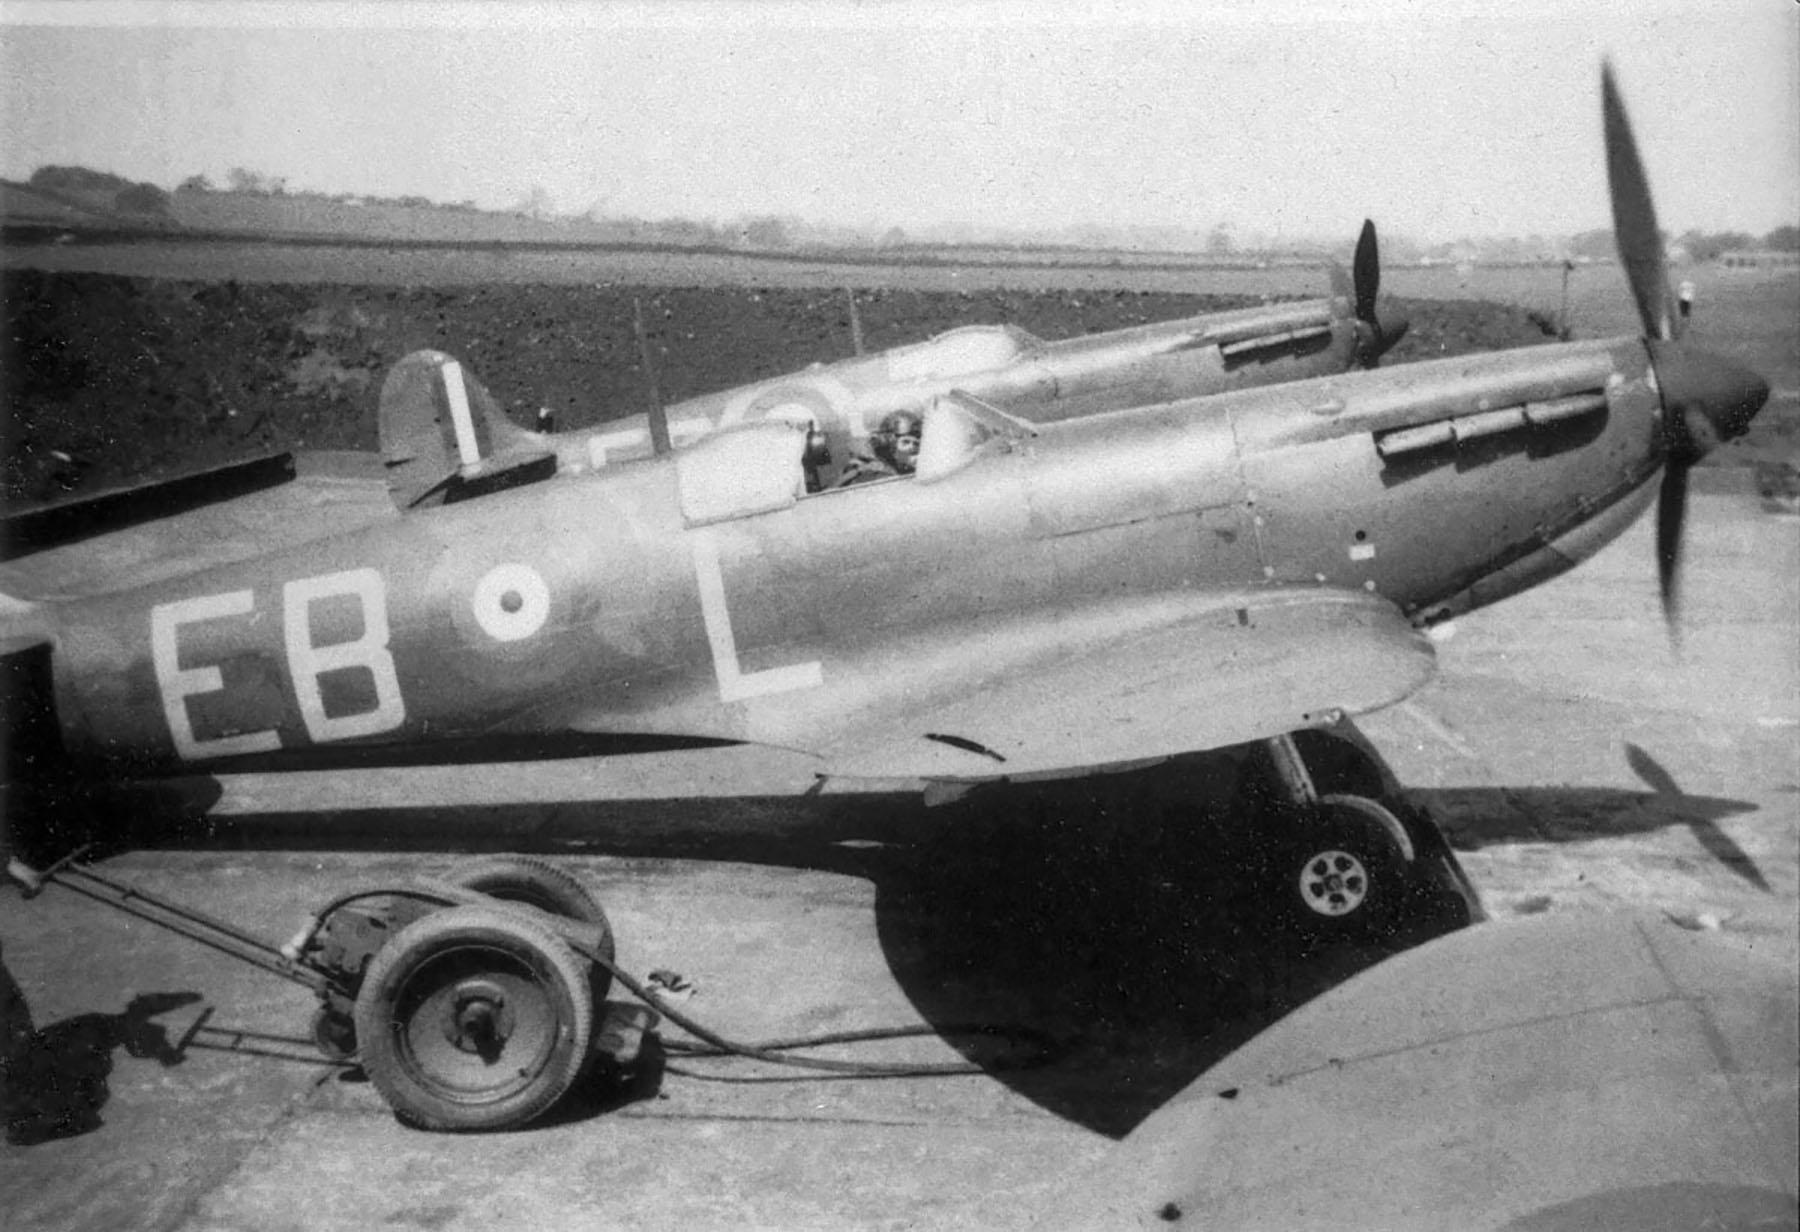 Spitfire MkIa RAF 41Sqn EBL N3126 flown by Ted Shipman Catterick England 1939 01